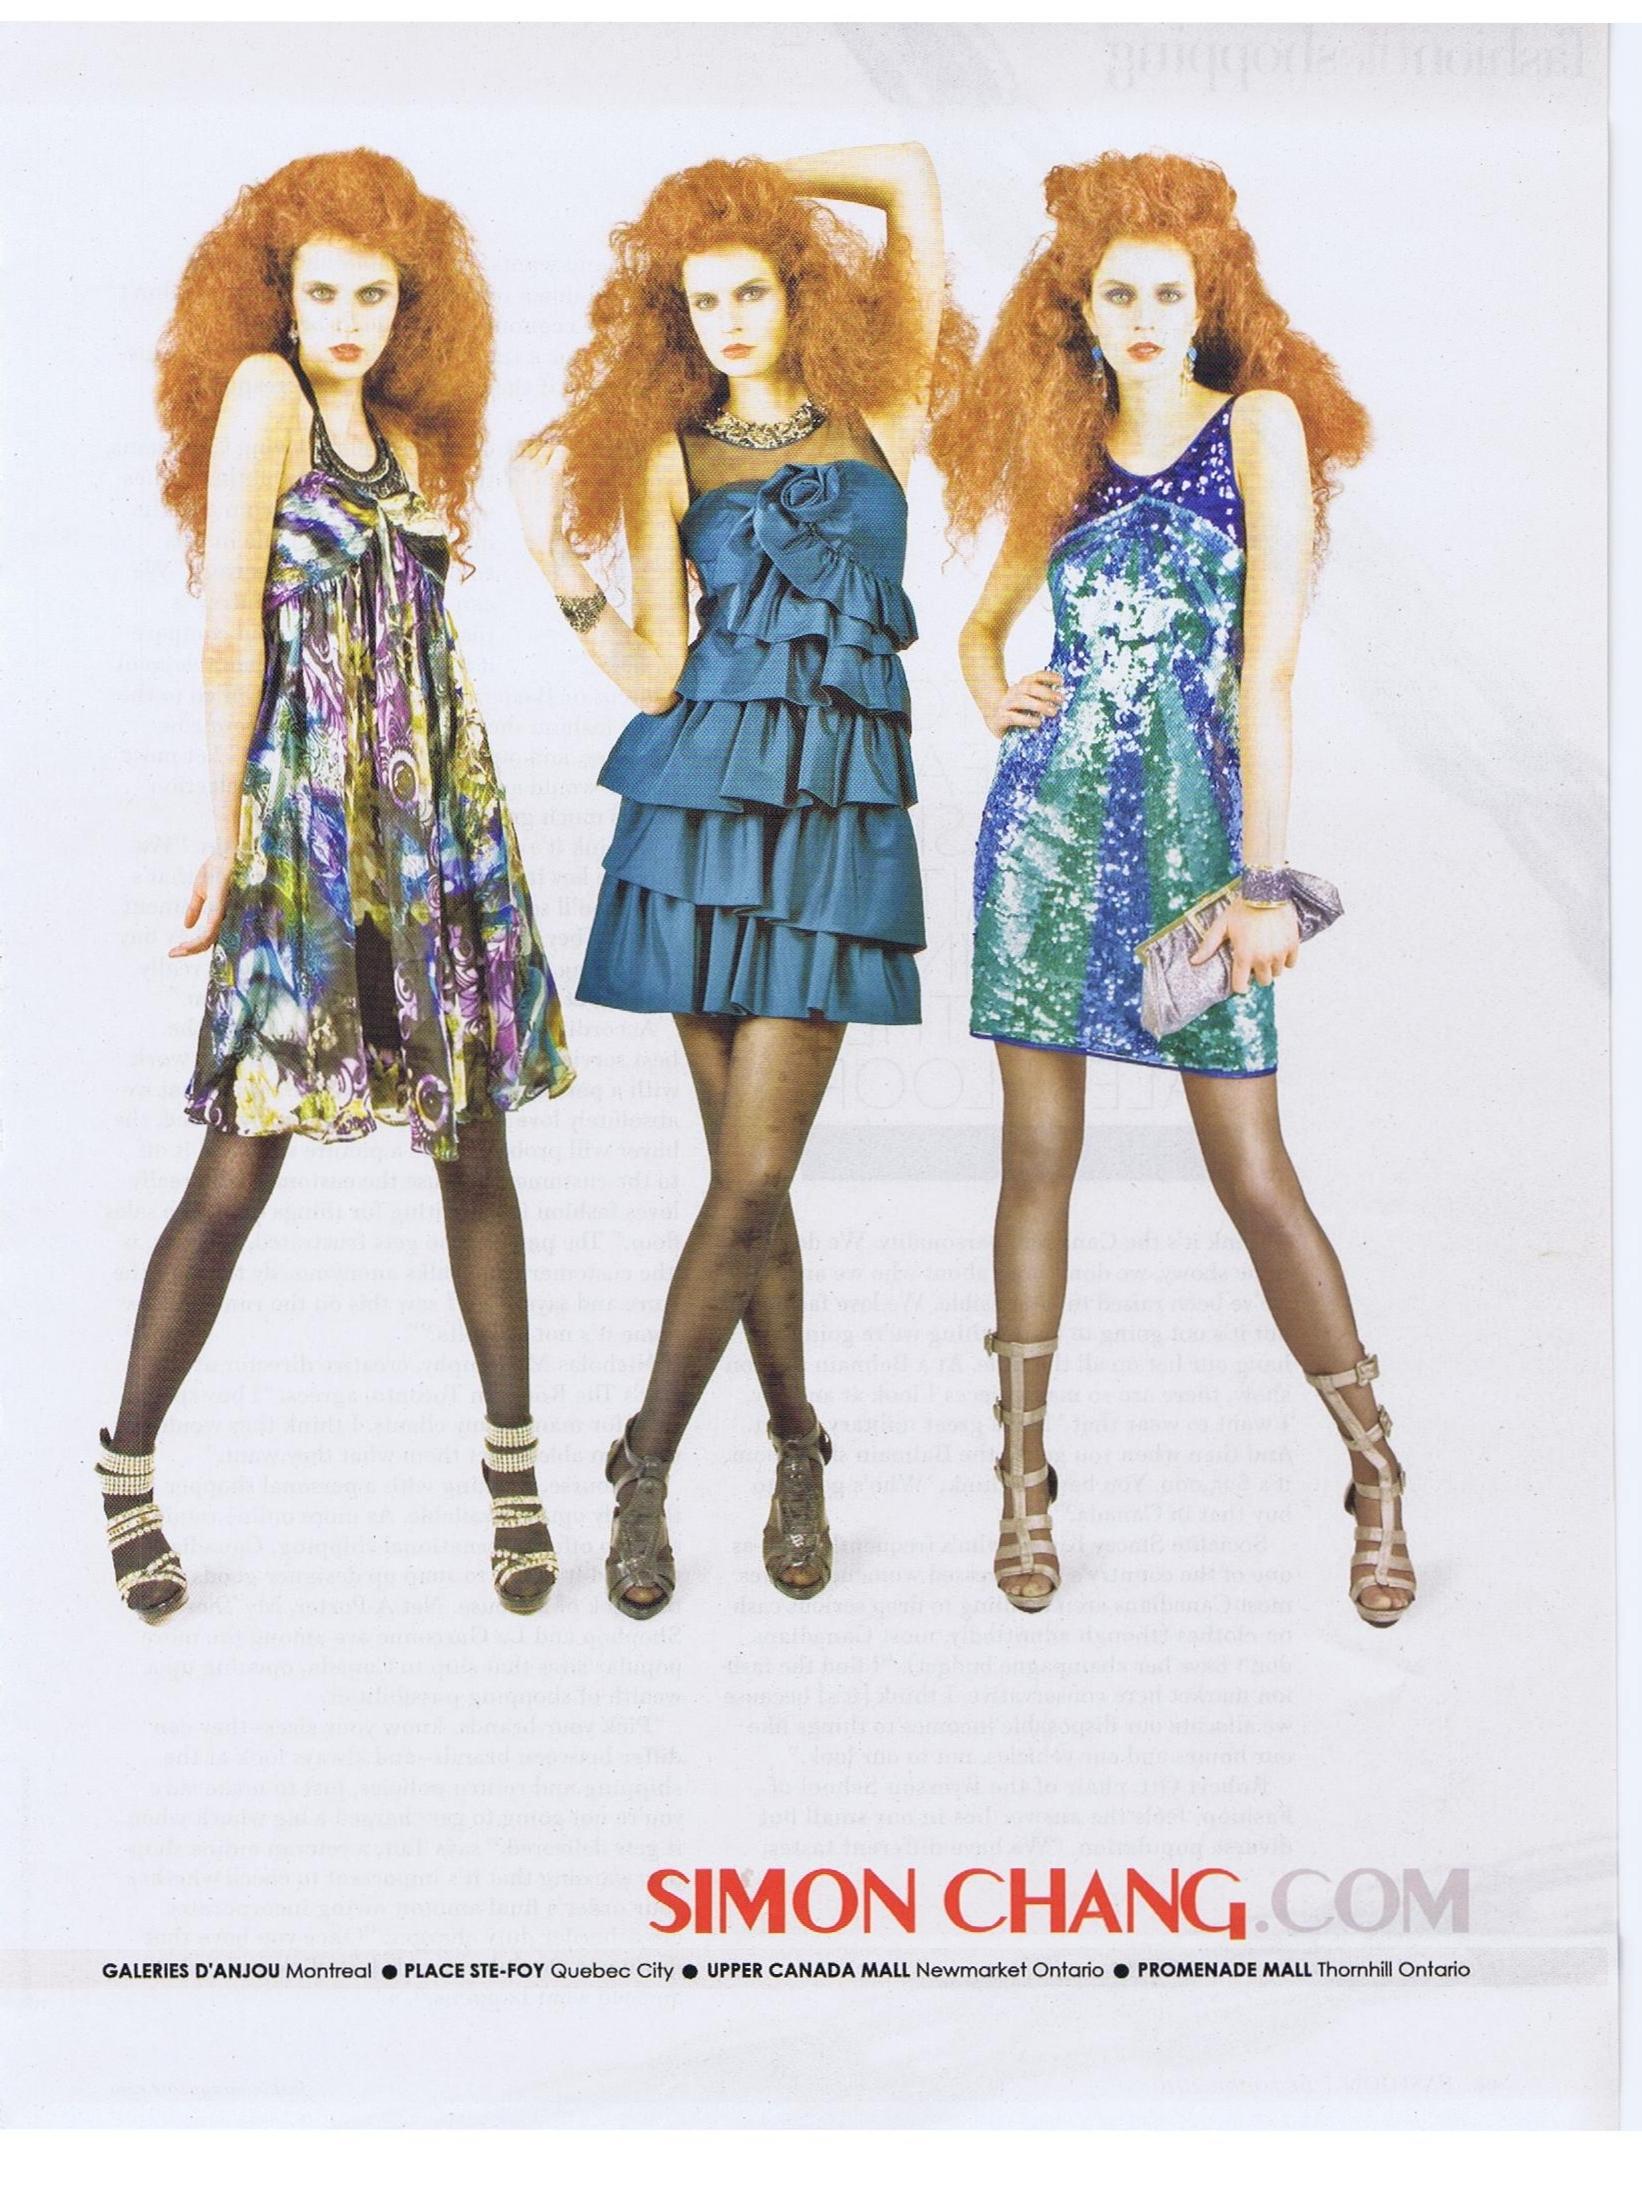 Simon chang fashion designer